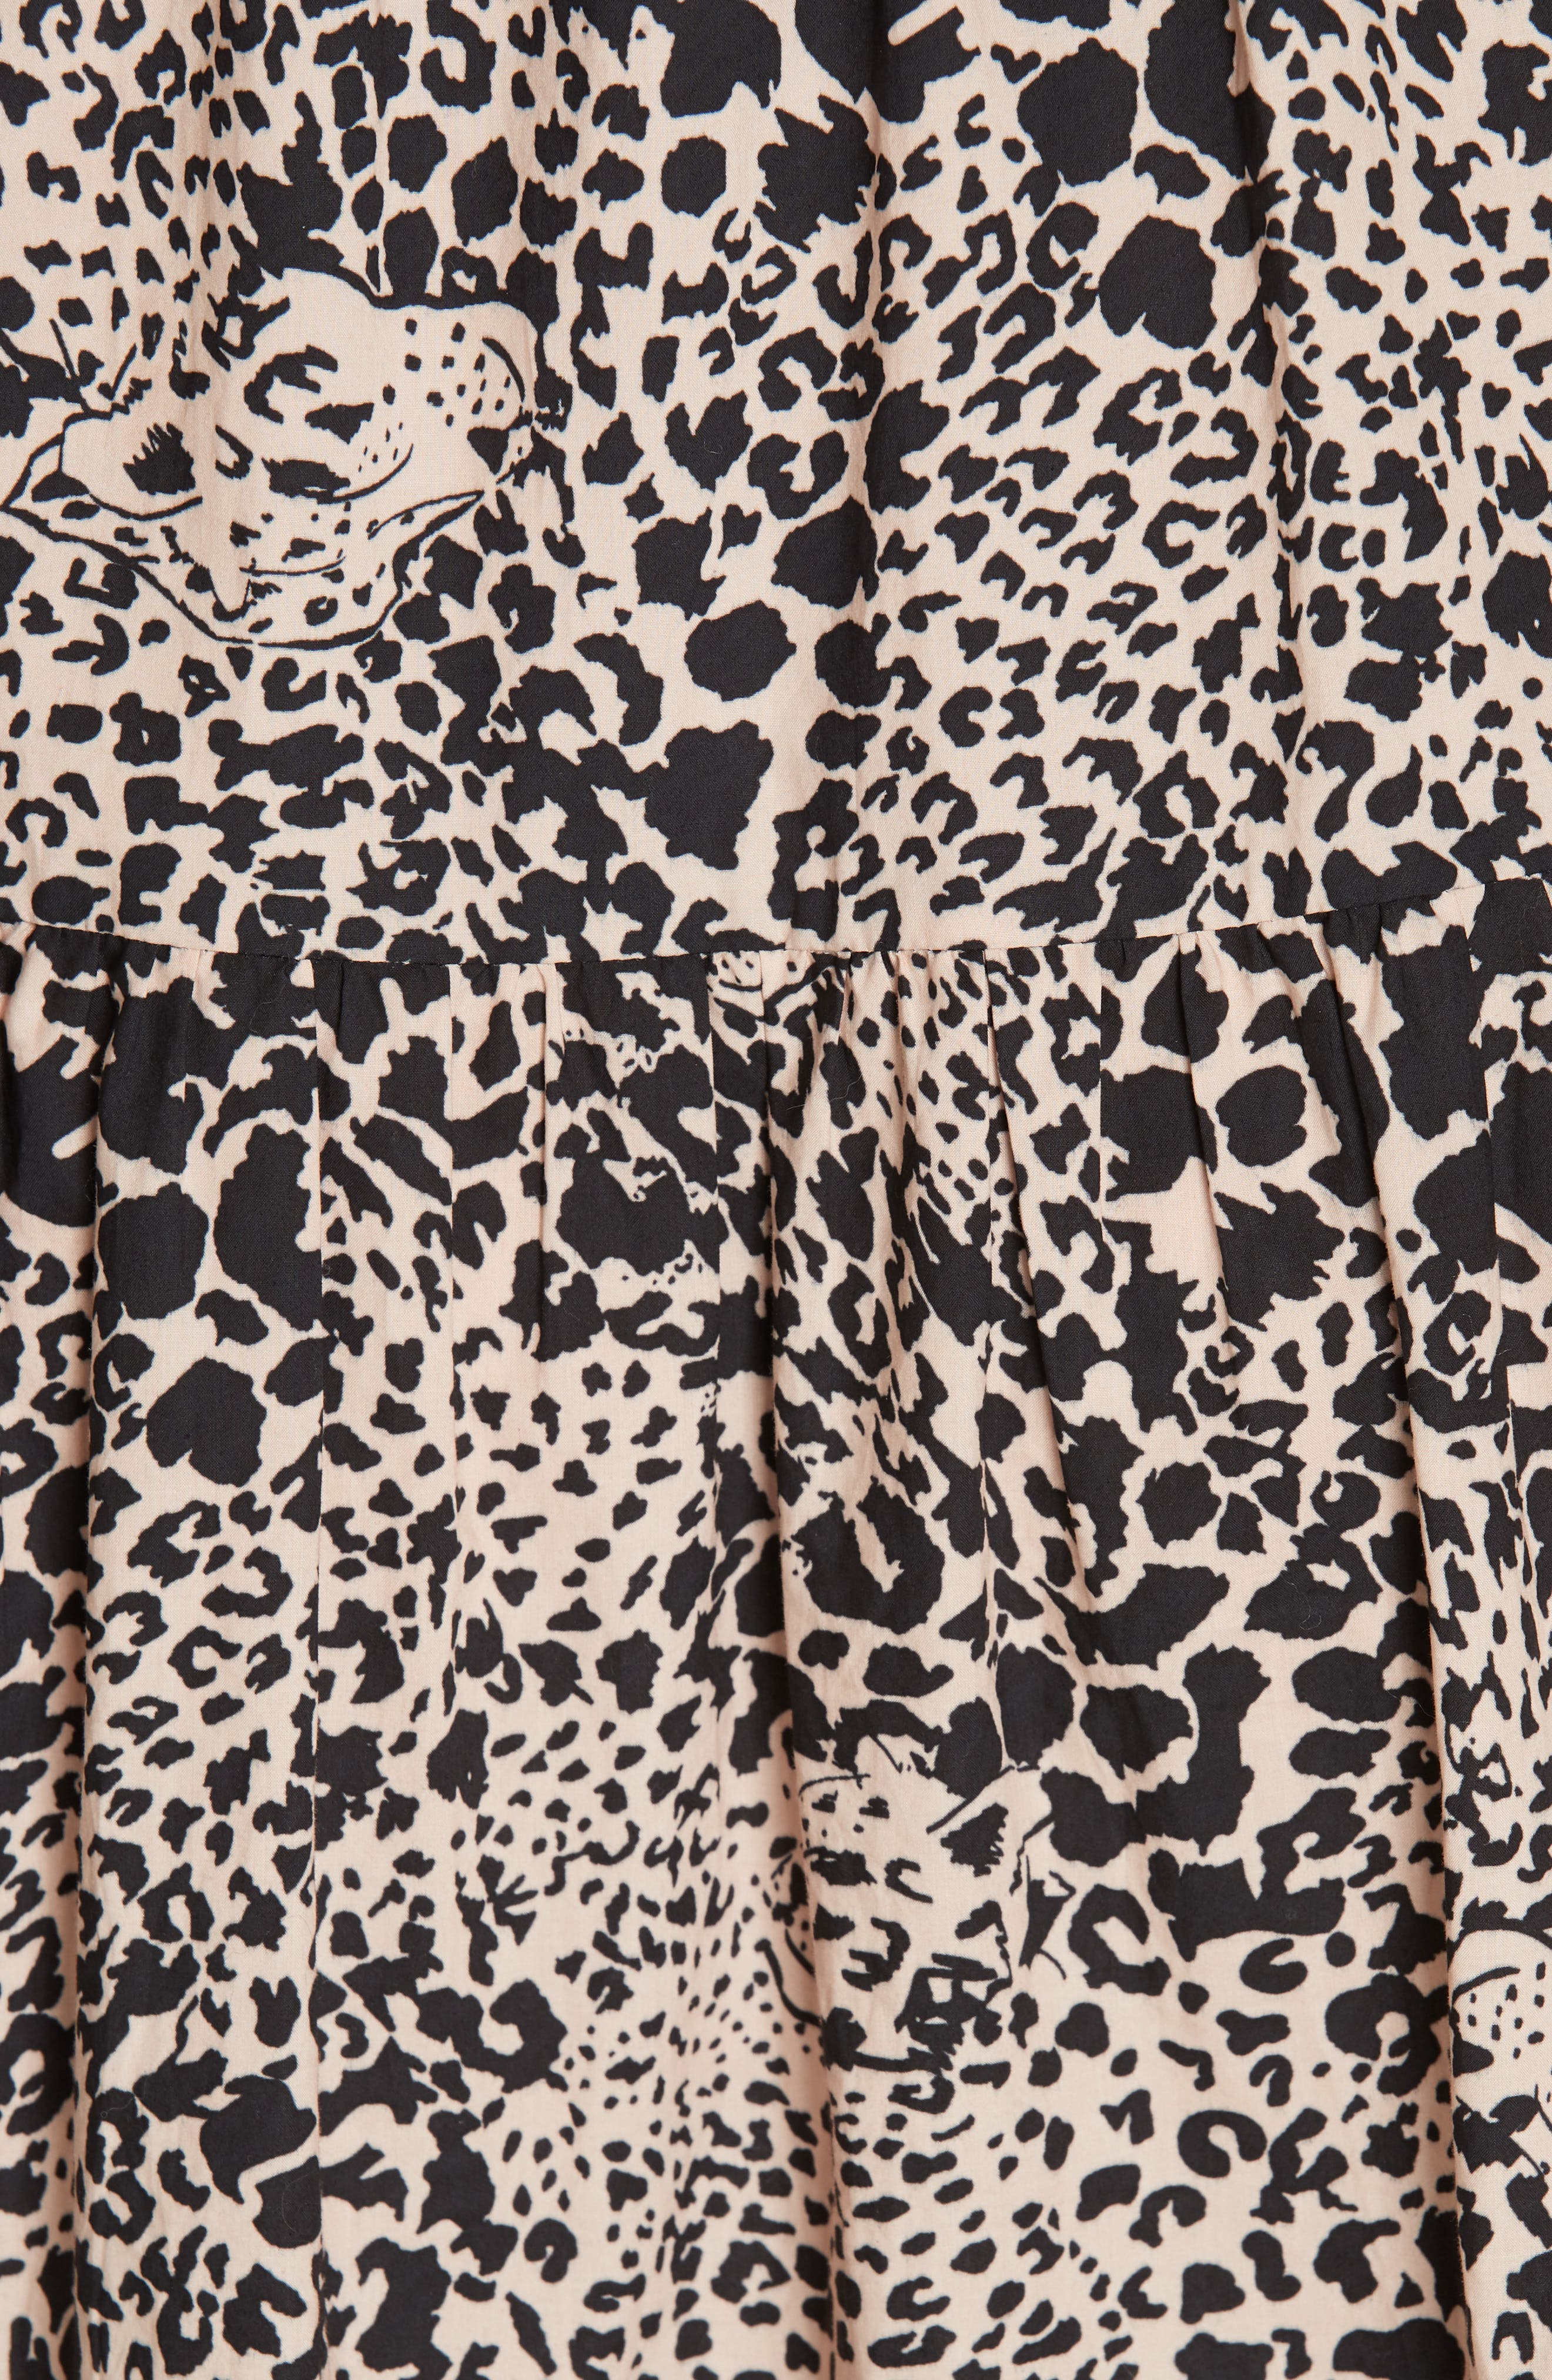 Leopard Print Smocked Dress,                             Alternate thumbnail 6, color,                             CHAMPAGNE COMBO